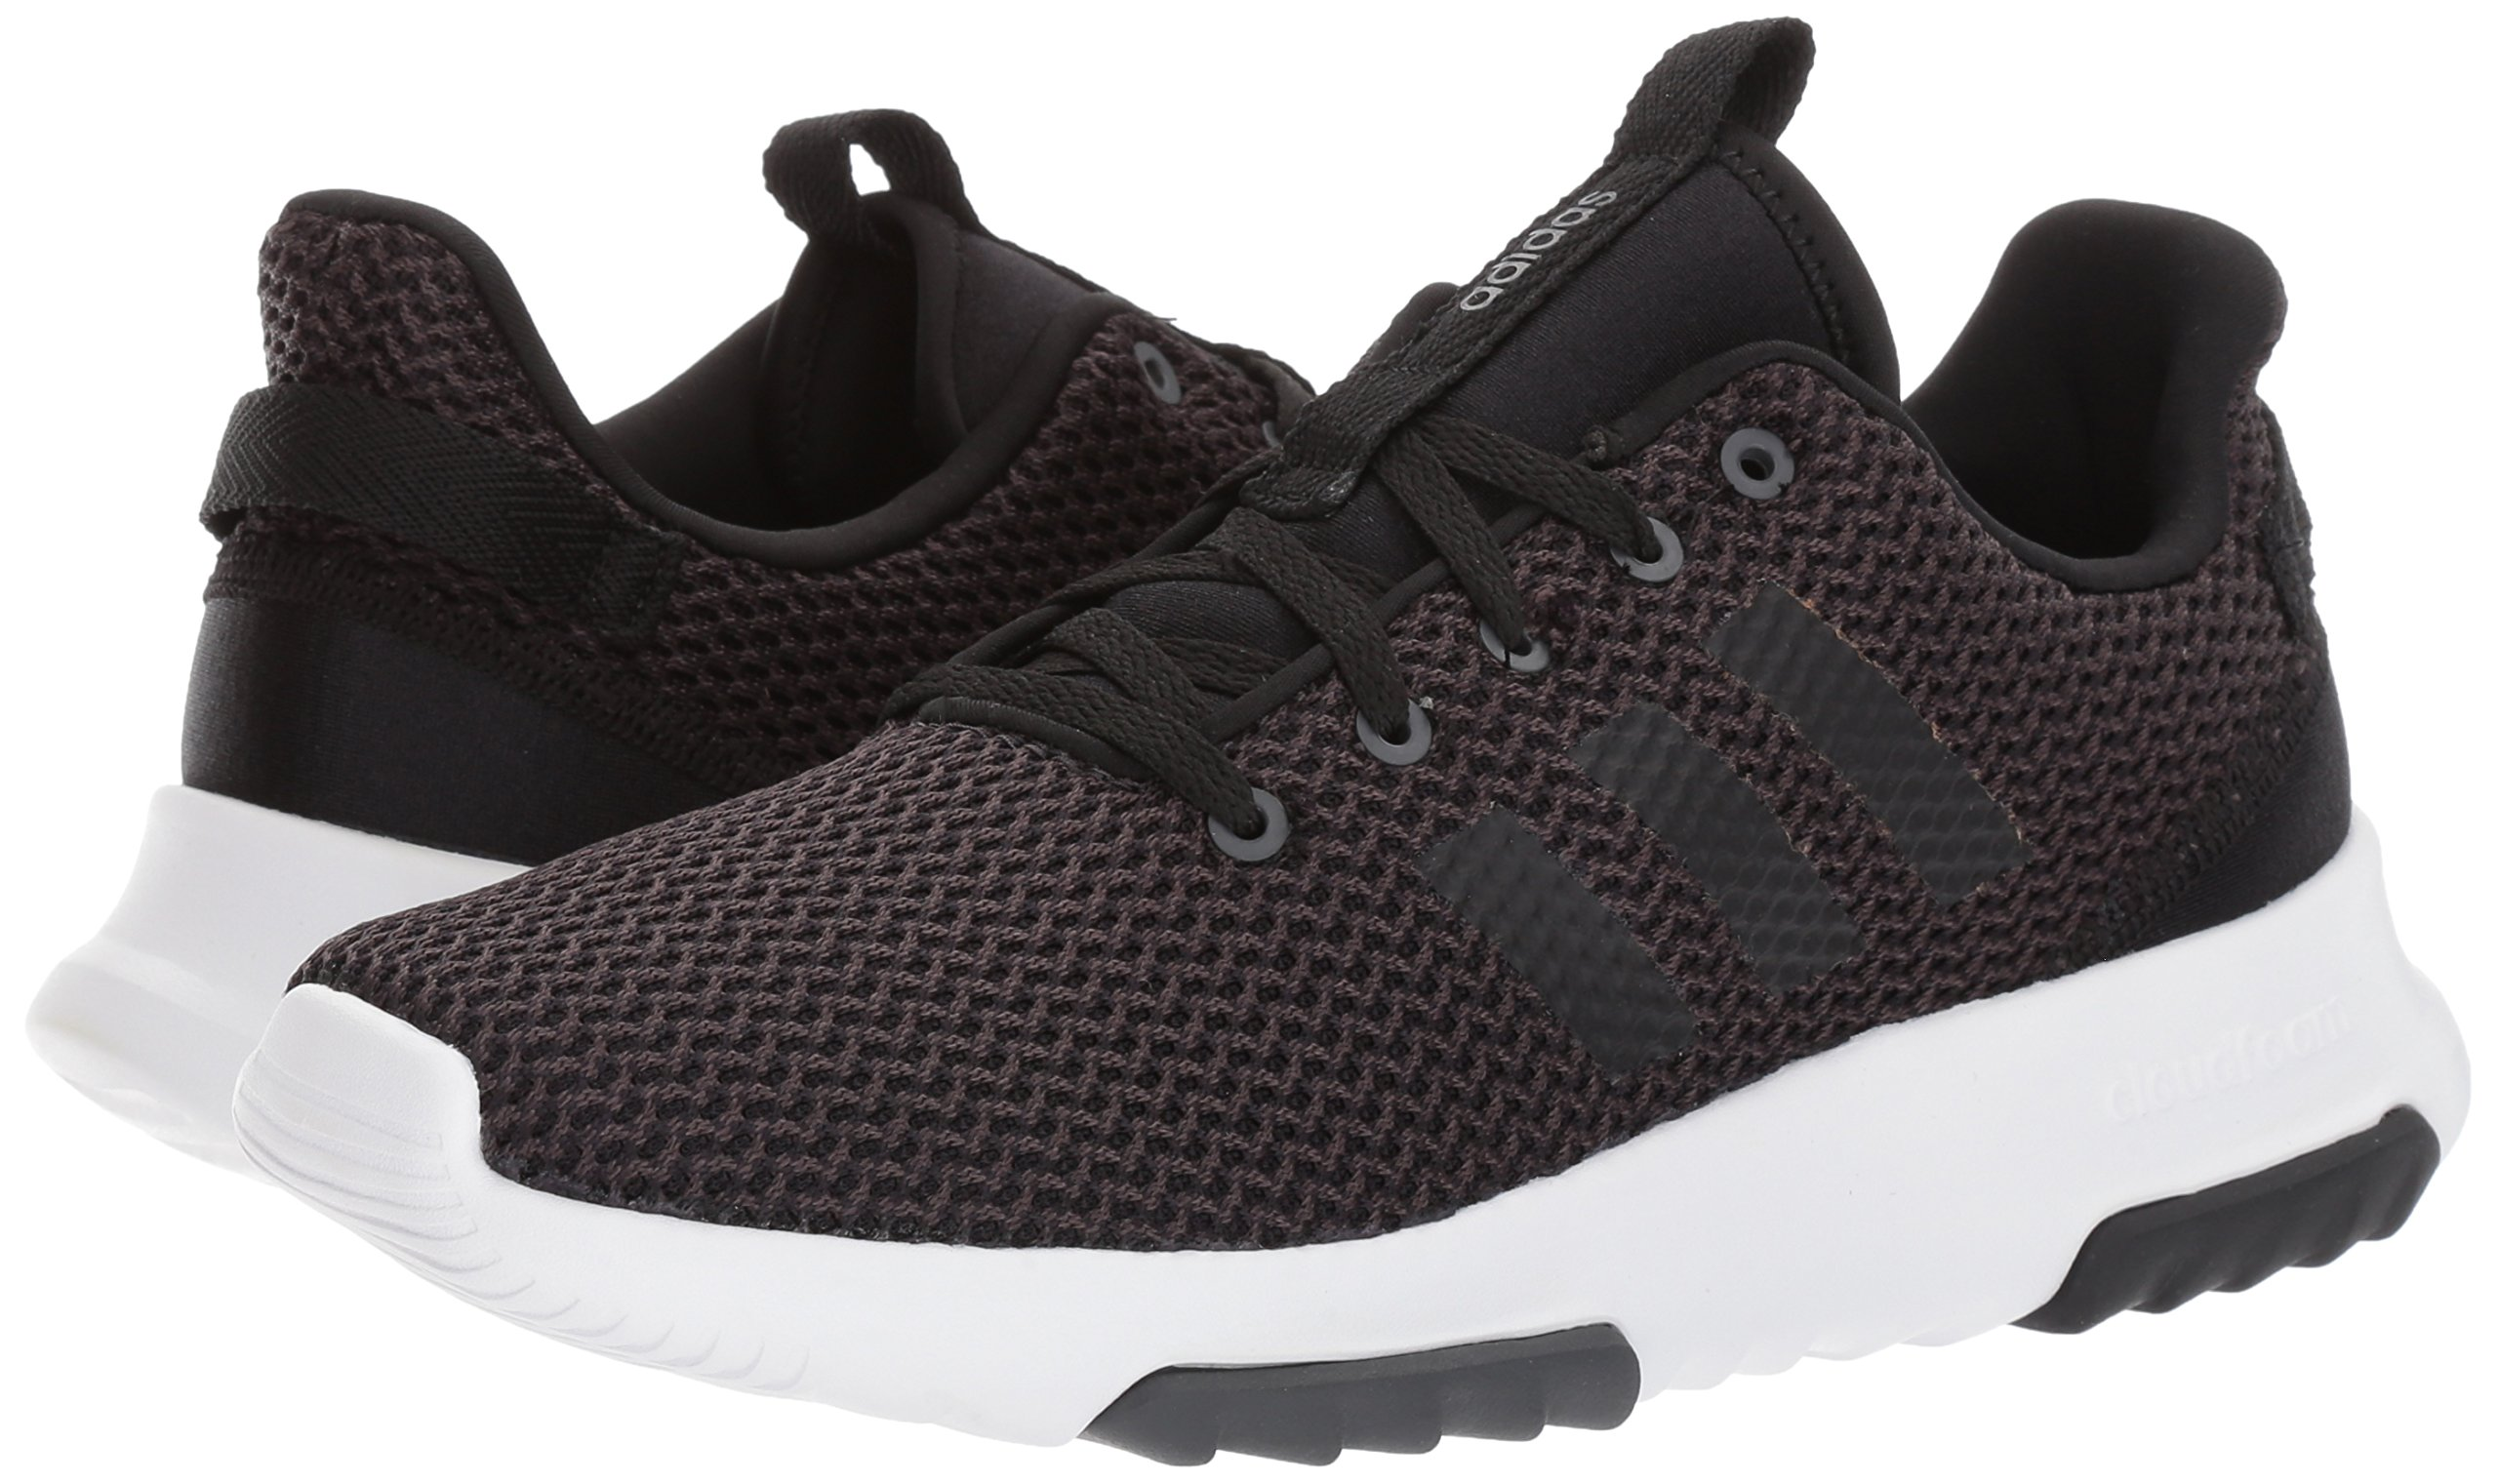 Mens Cf Racer Tr Running Shoes, Black adidas